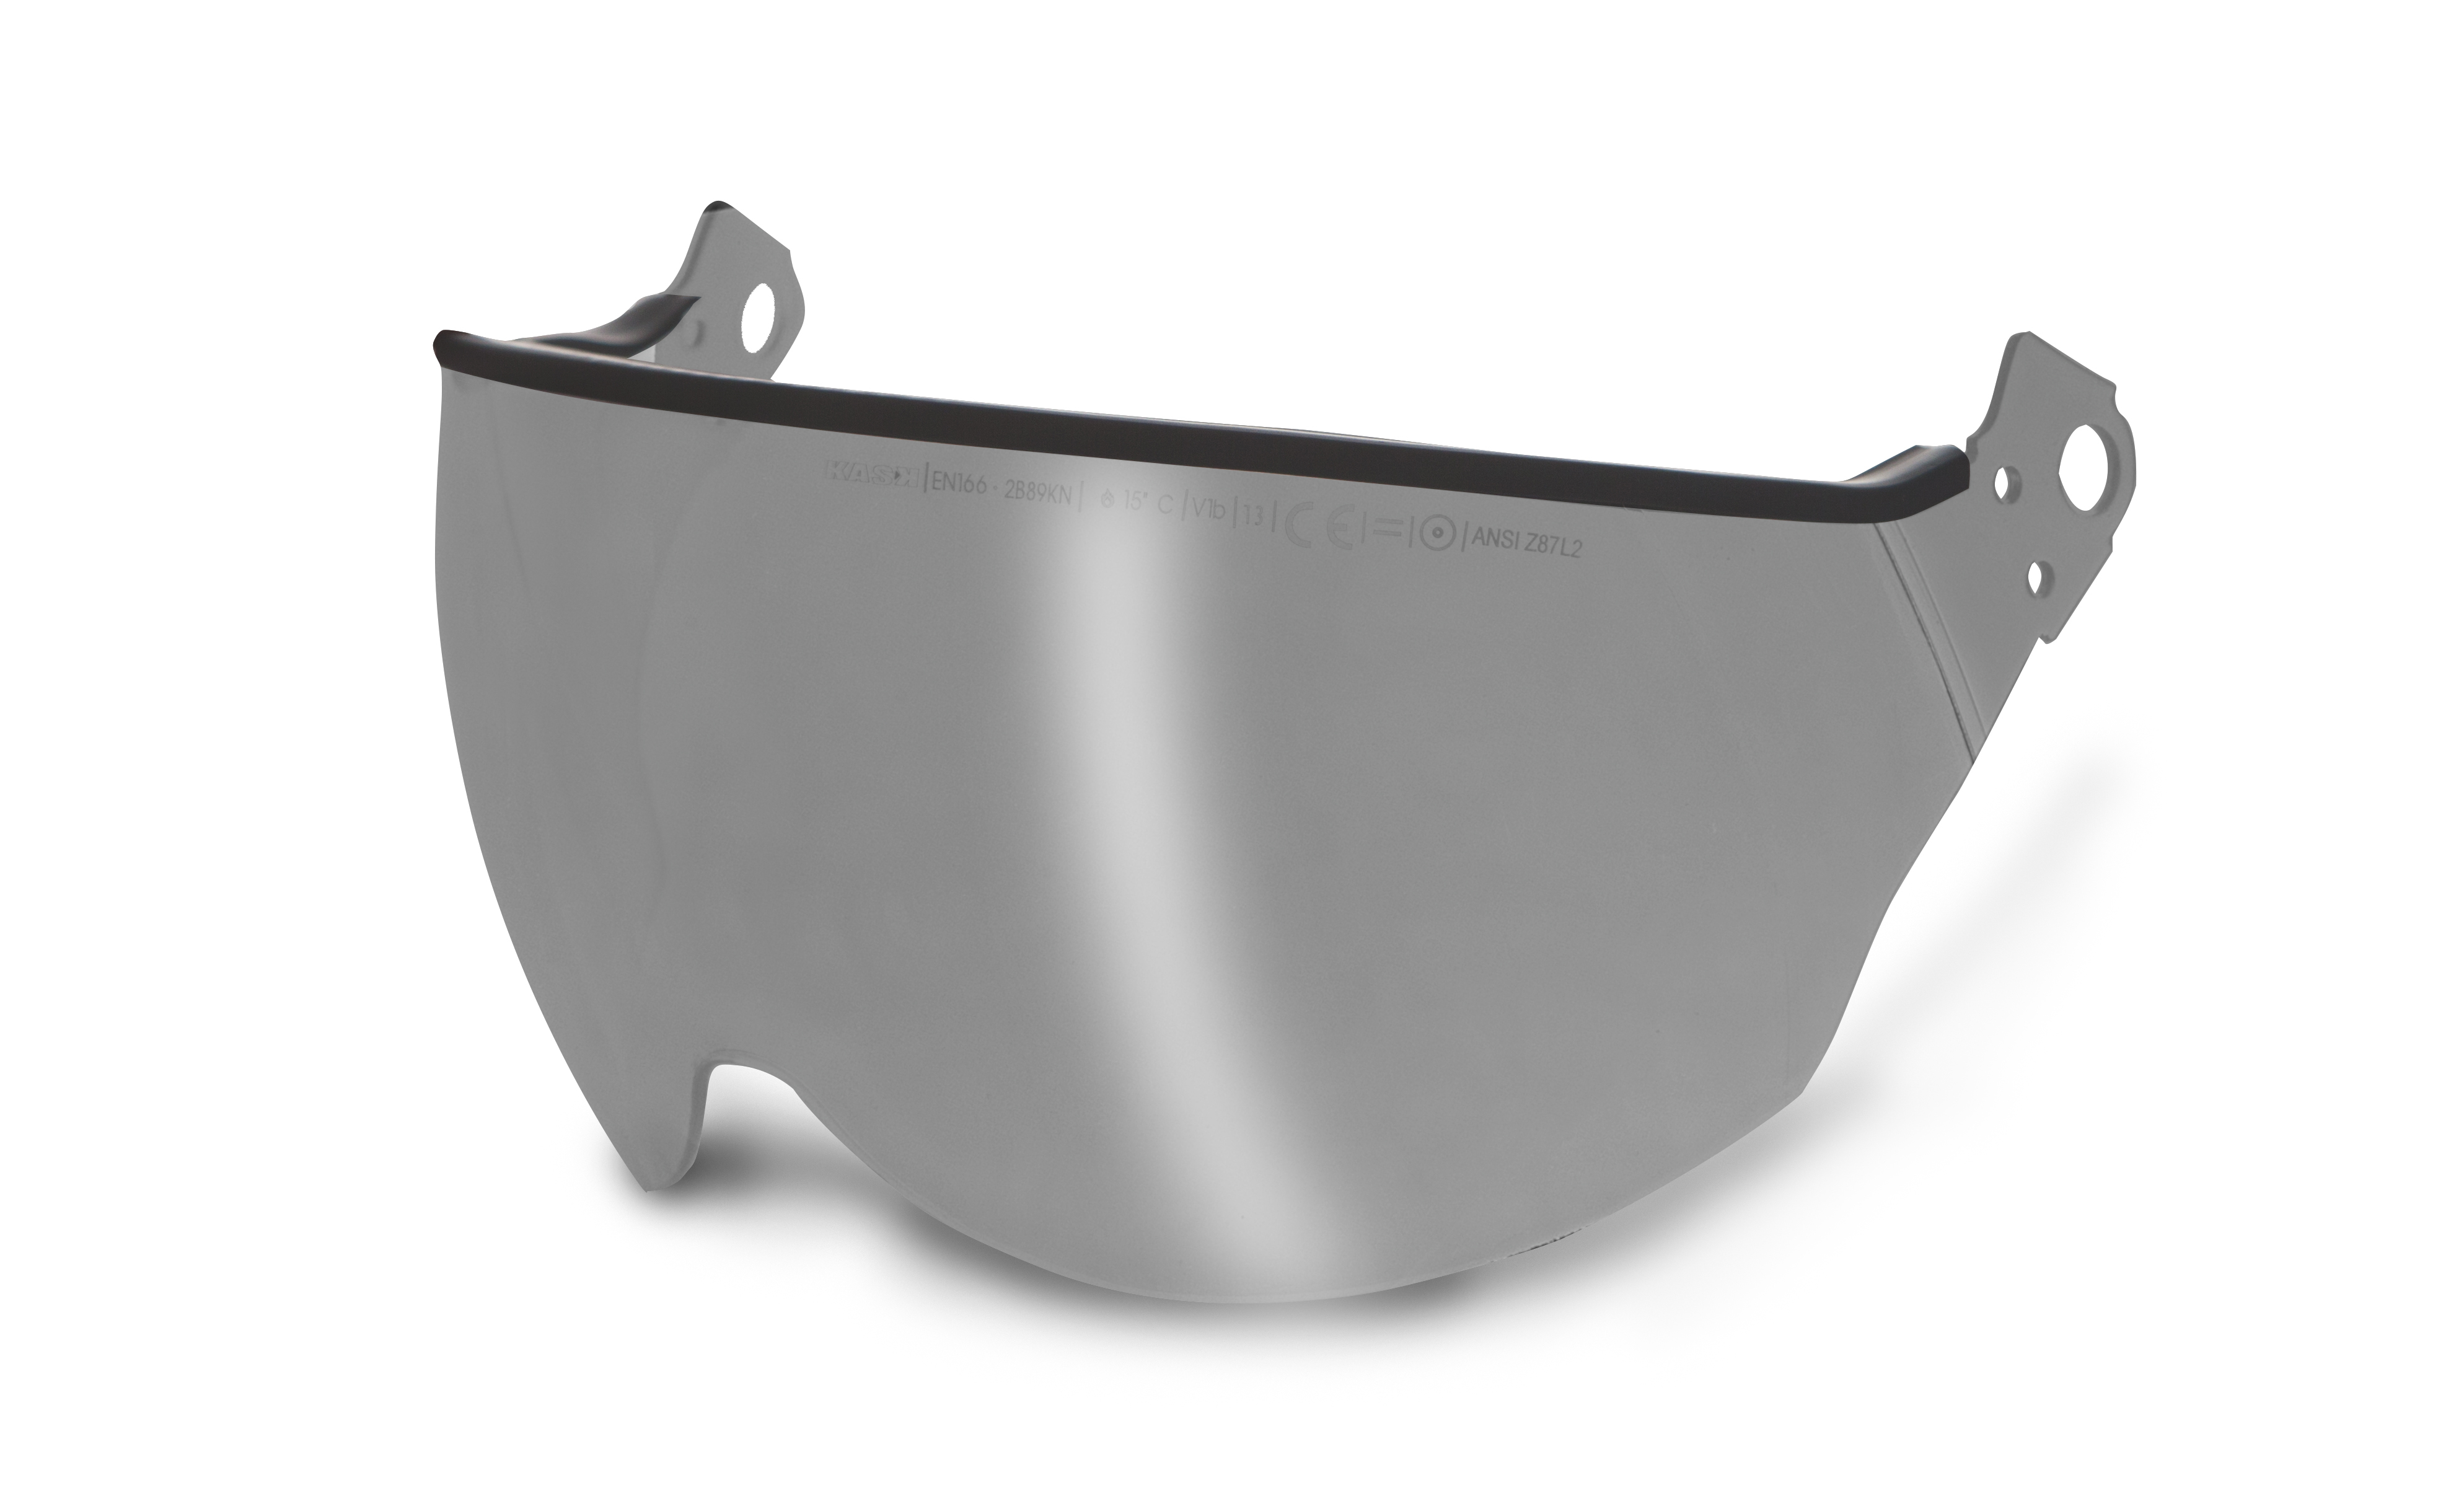 Kask Polycarbonate Visor — Smoke KA-WVI00002.009